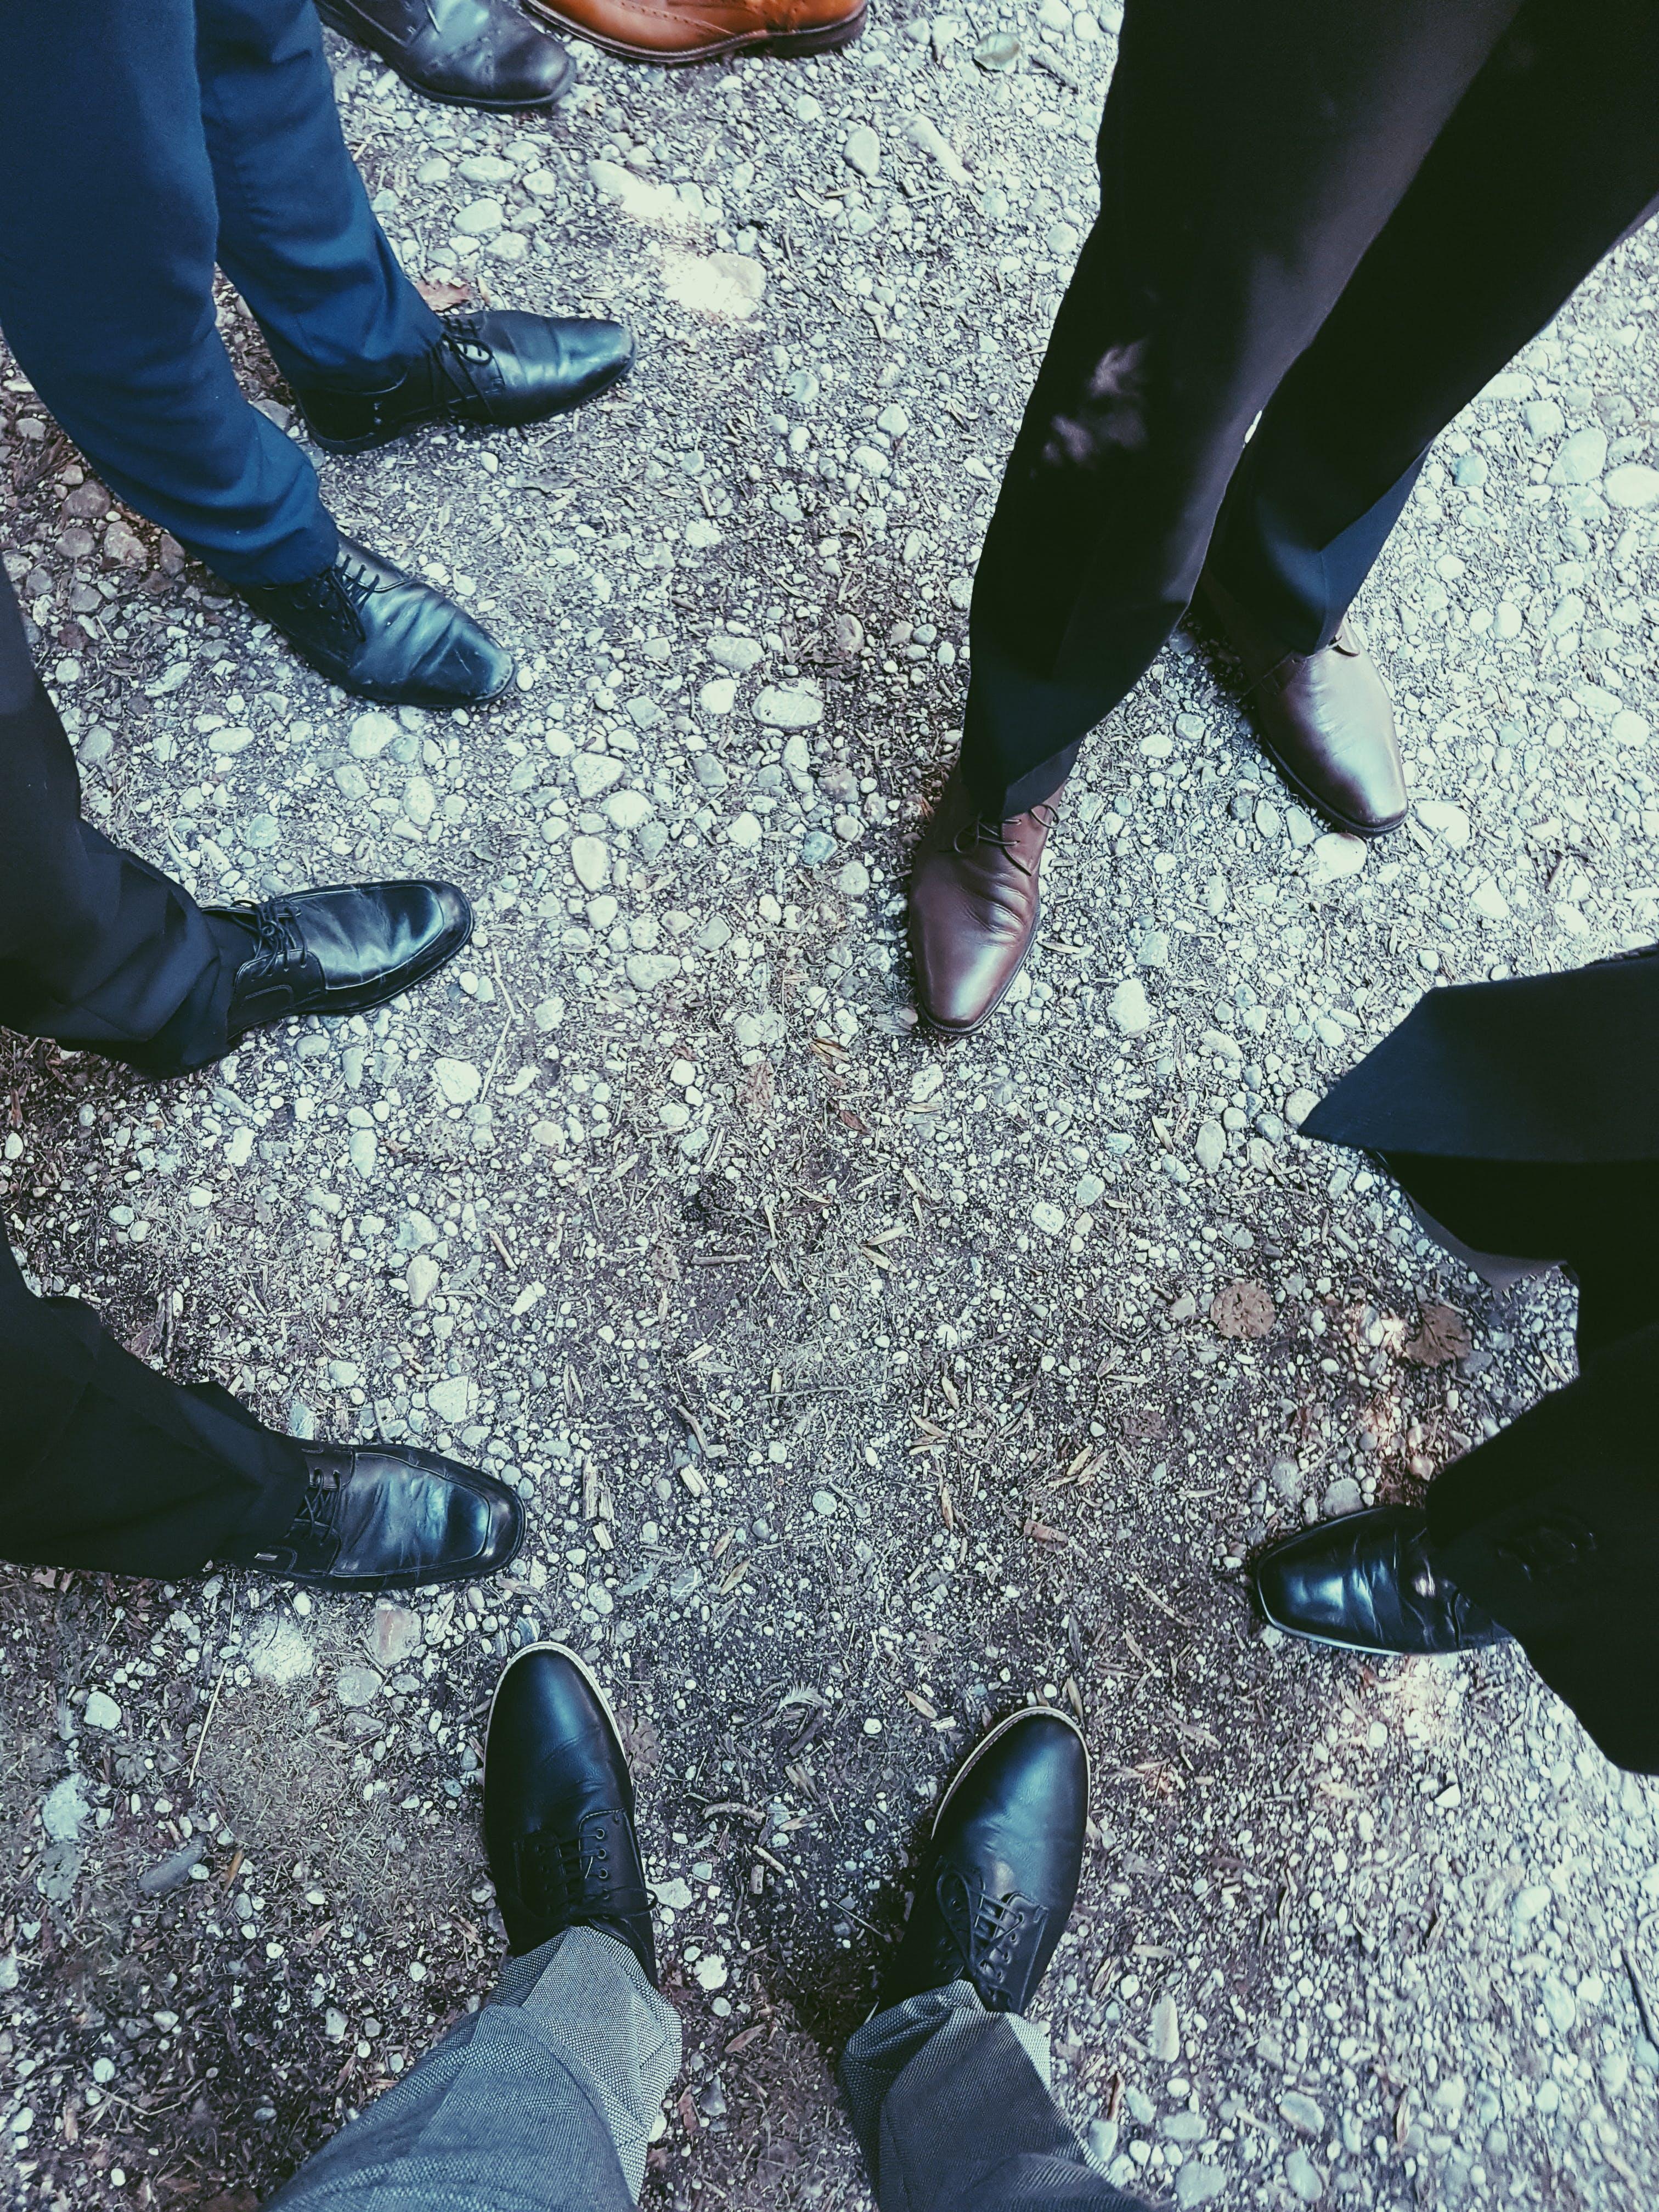 foot, footwear, formal dress